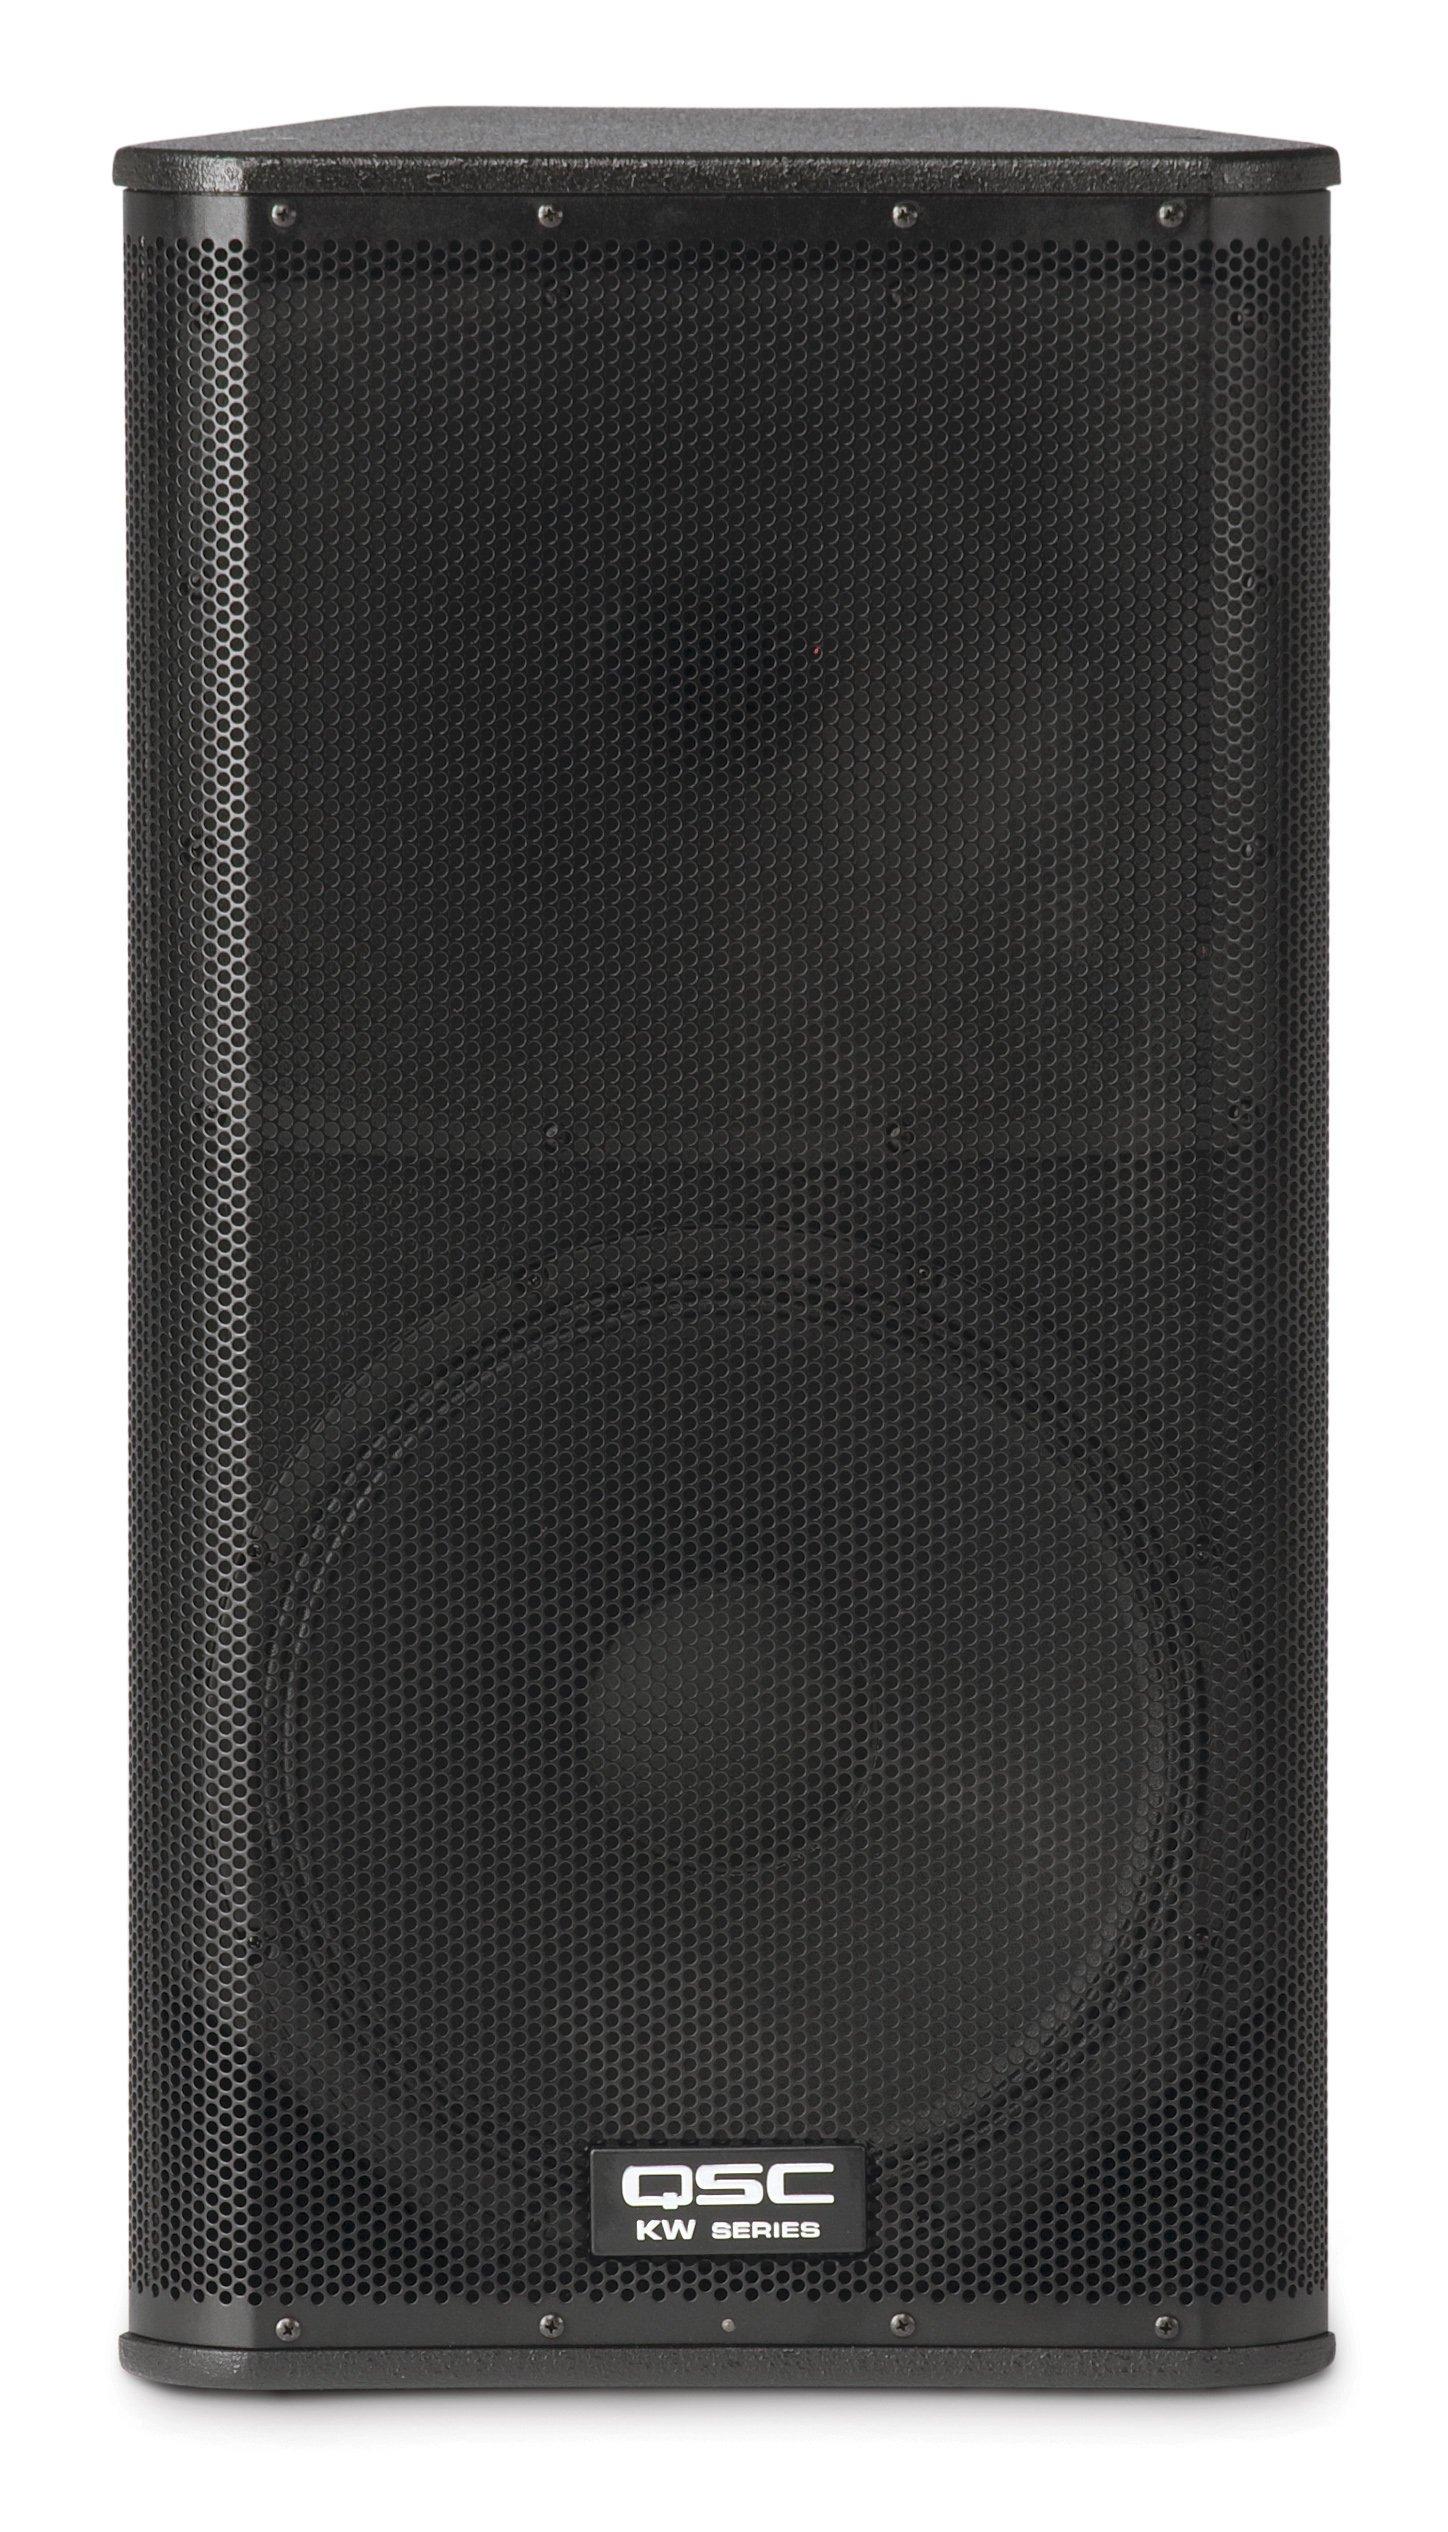 QSC KW152 15'' 1000 Watt 2-Way Active PA Loudspeaker by QSC